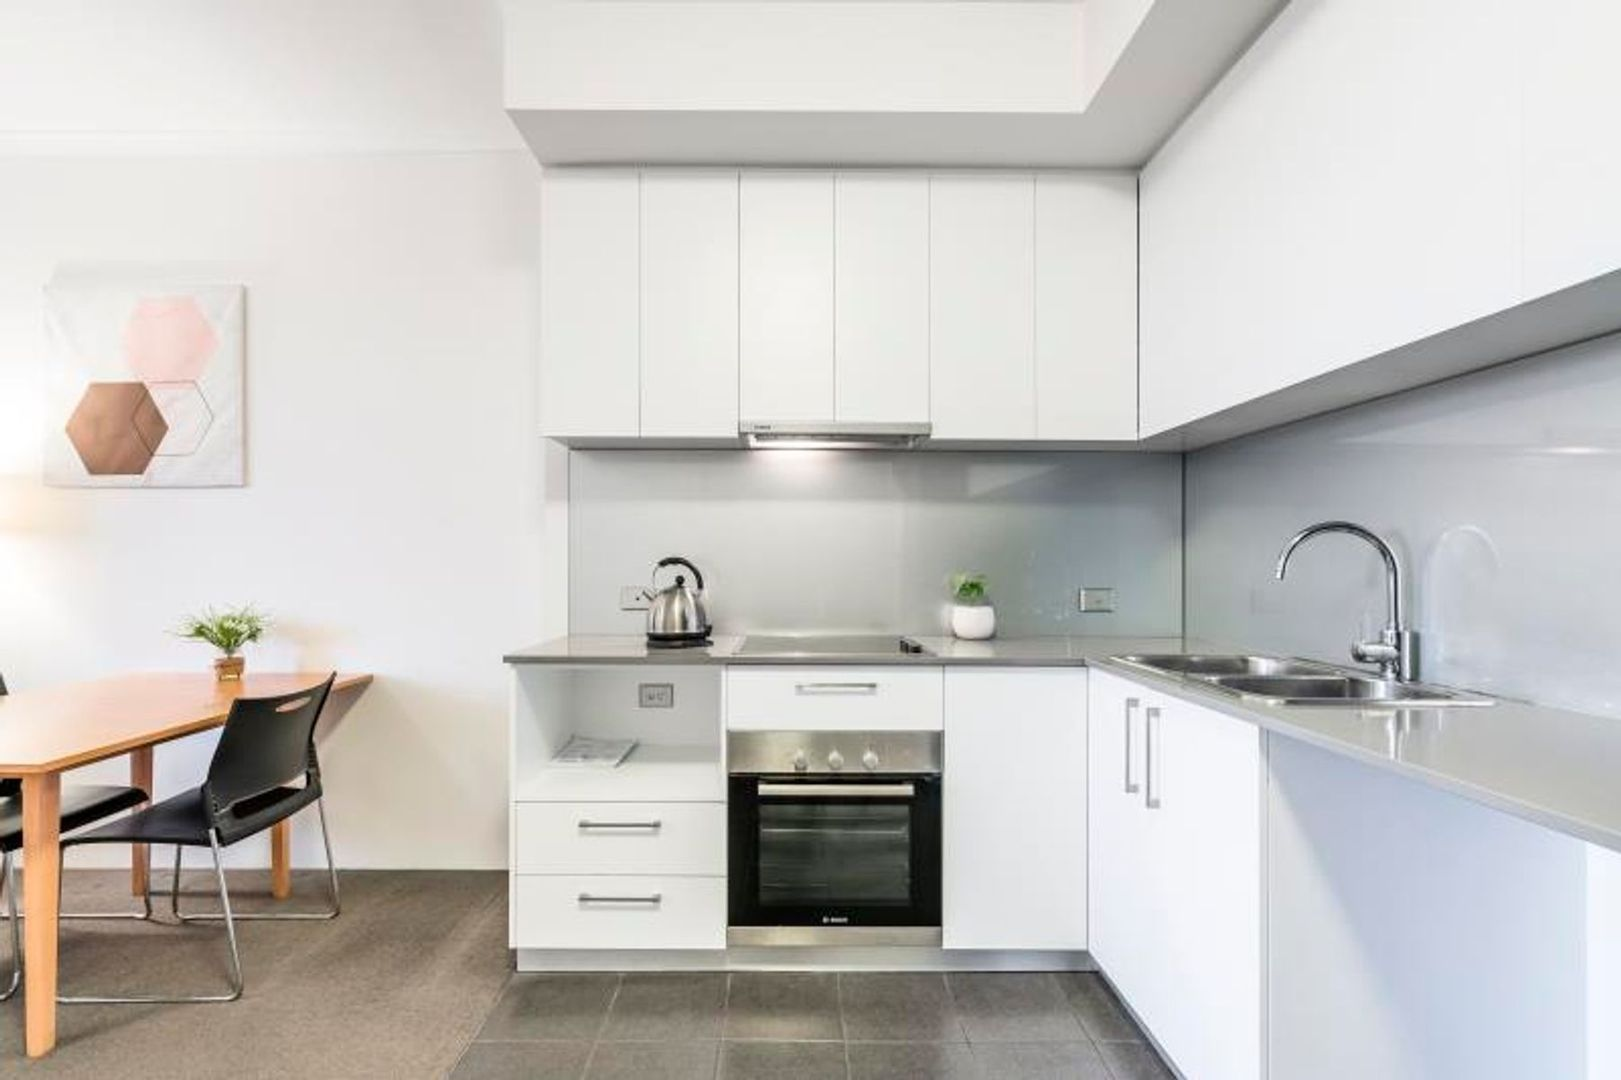 110/15 Aberdeen Street, Perth WA 6000, Image 1